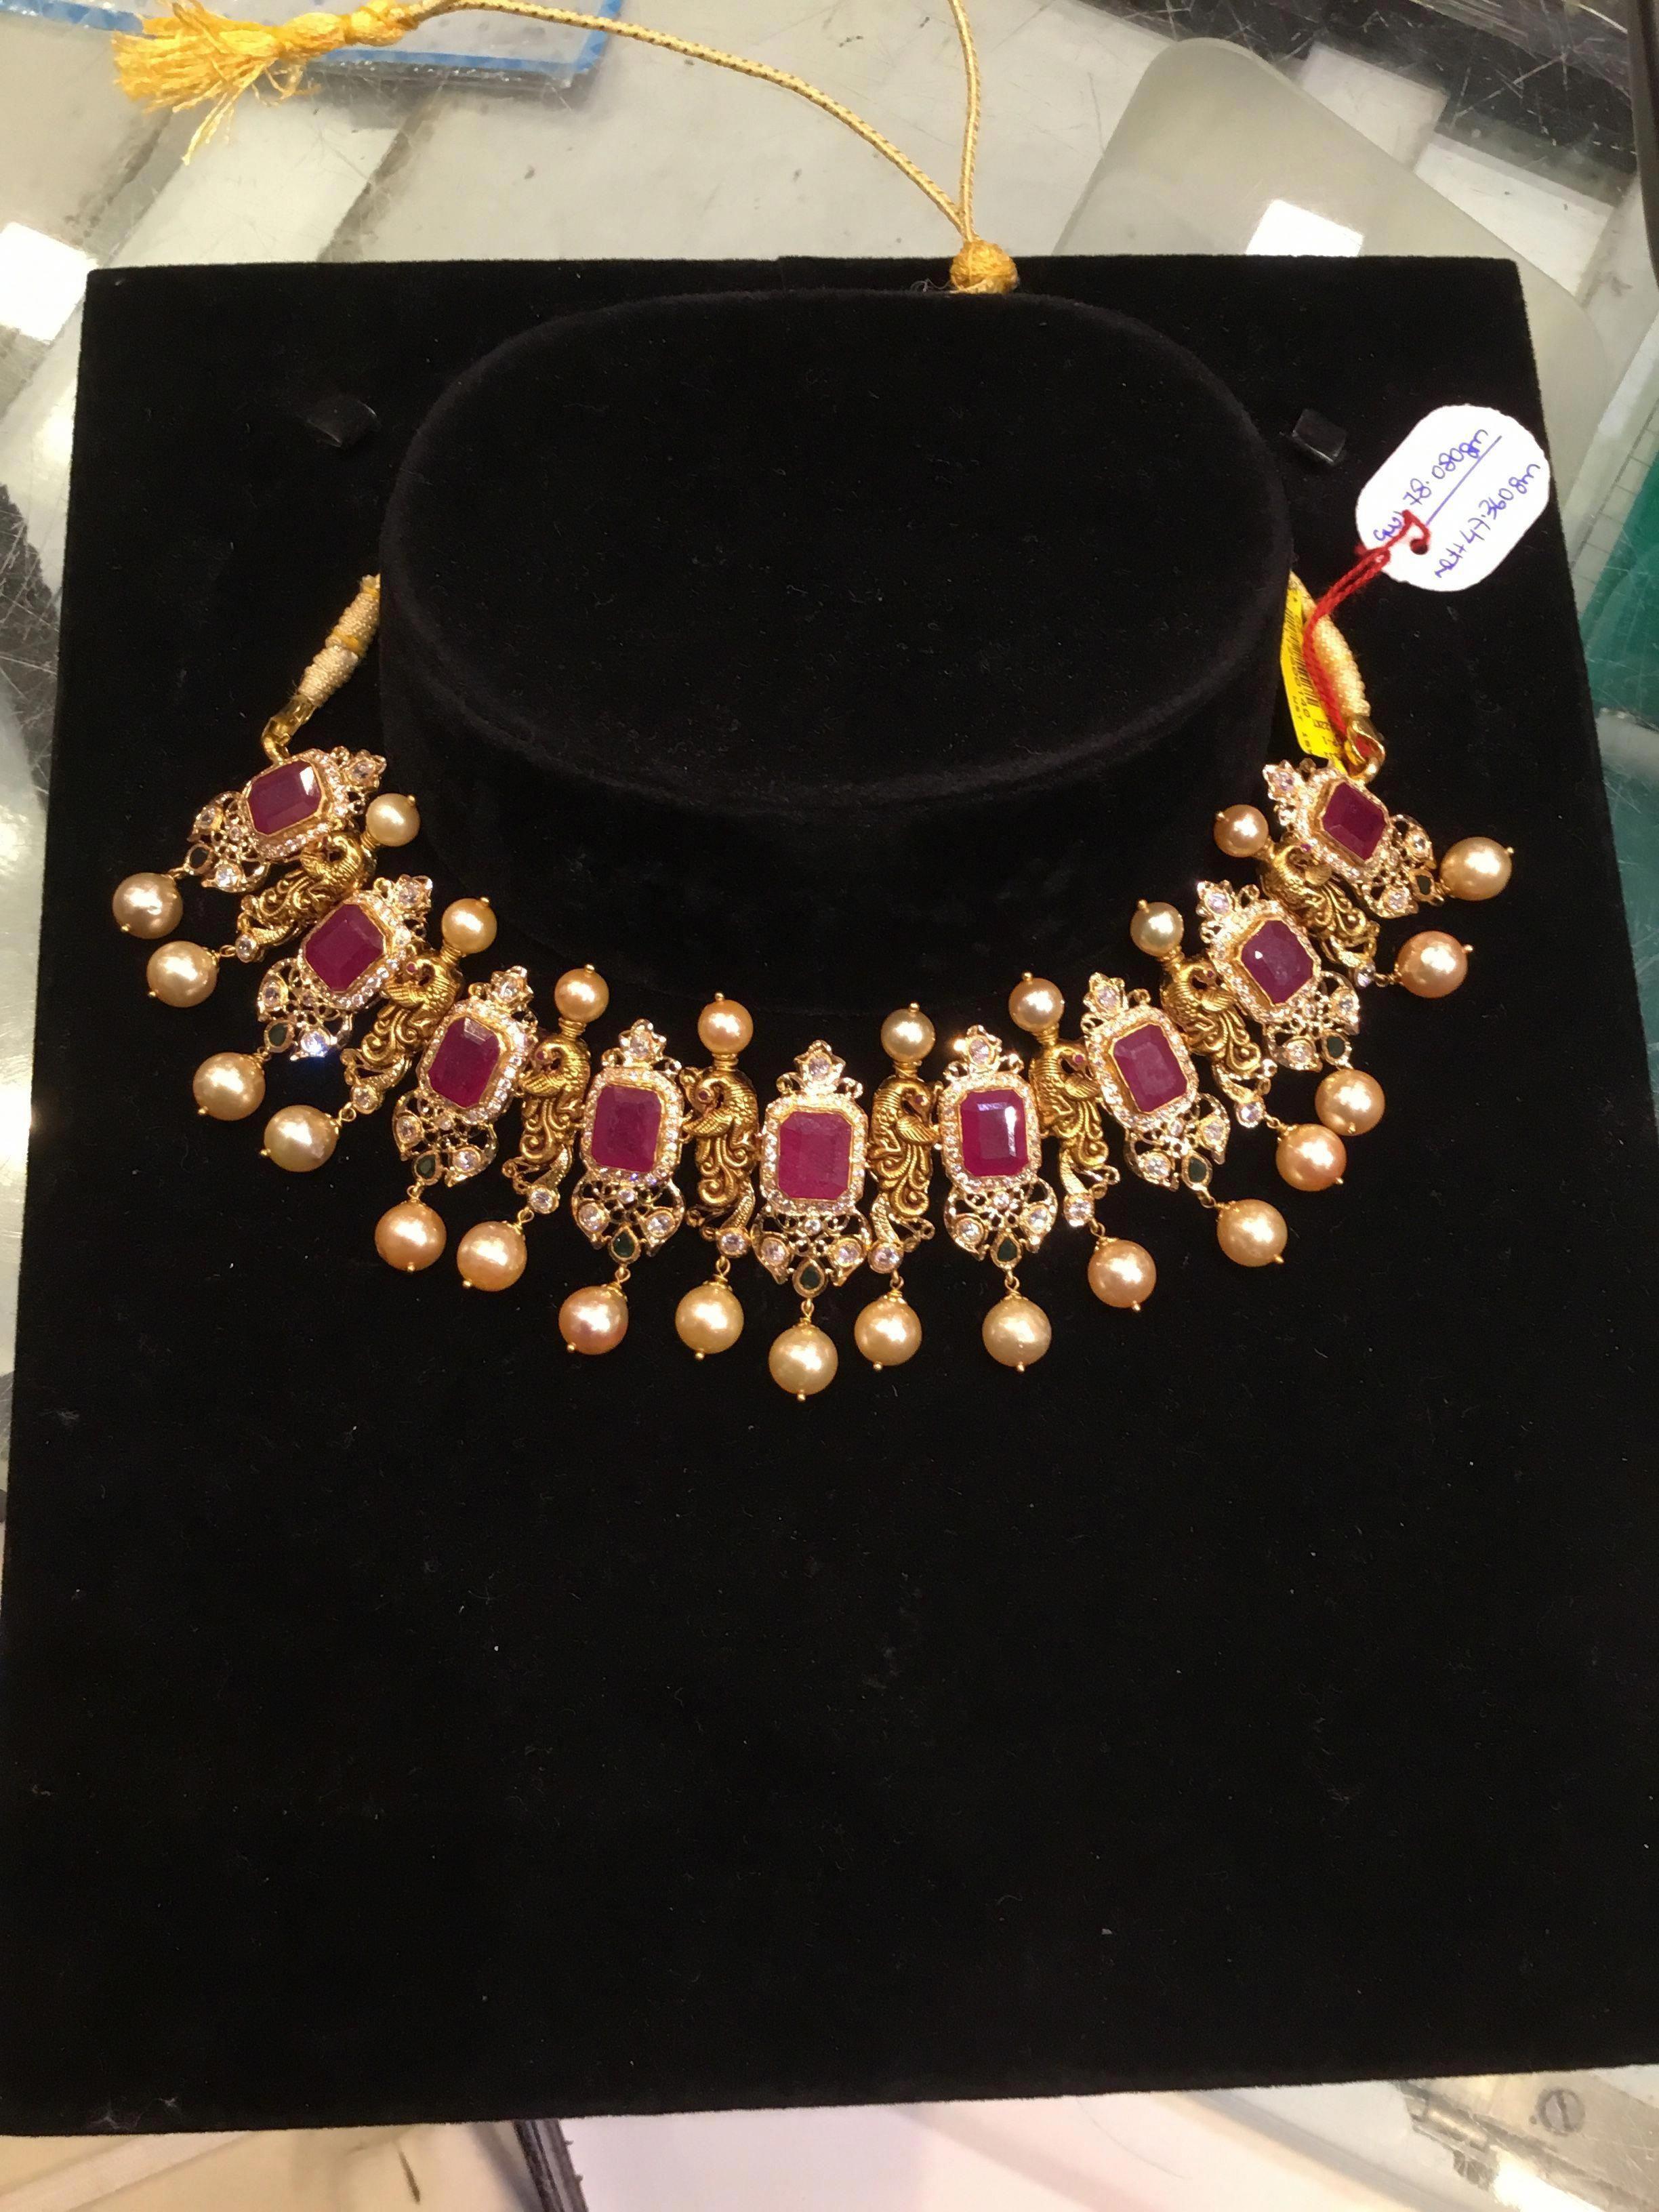 Fabulous Elegant Diamond Necklace Elegantdiamondnecklace Elegantbridaljewelryjewel Gold Jewelry Fashion Gold Jewellery Design Necklaces